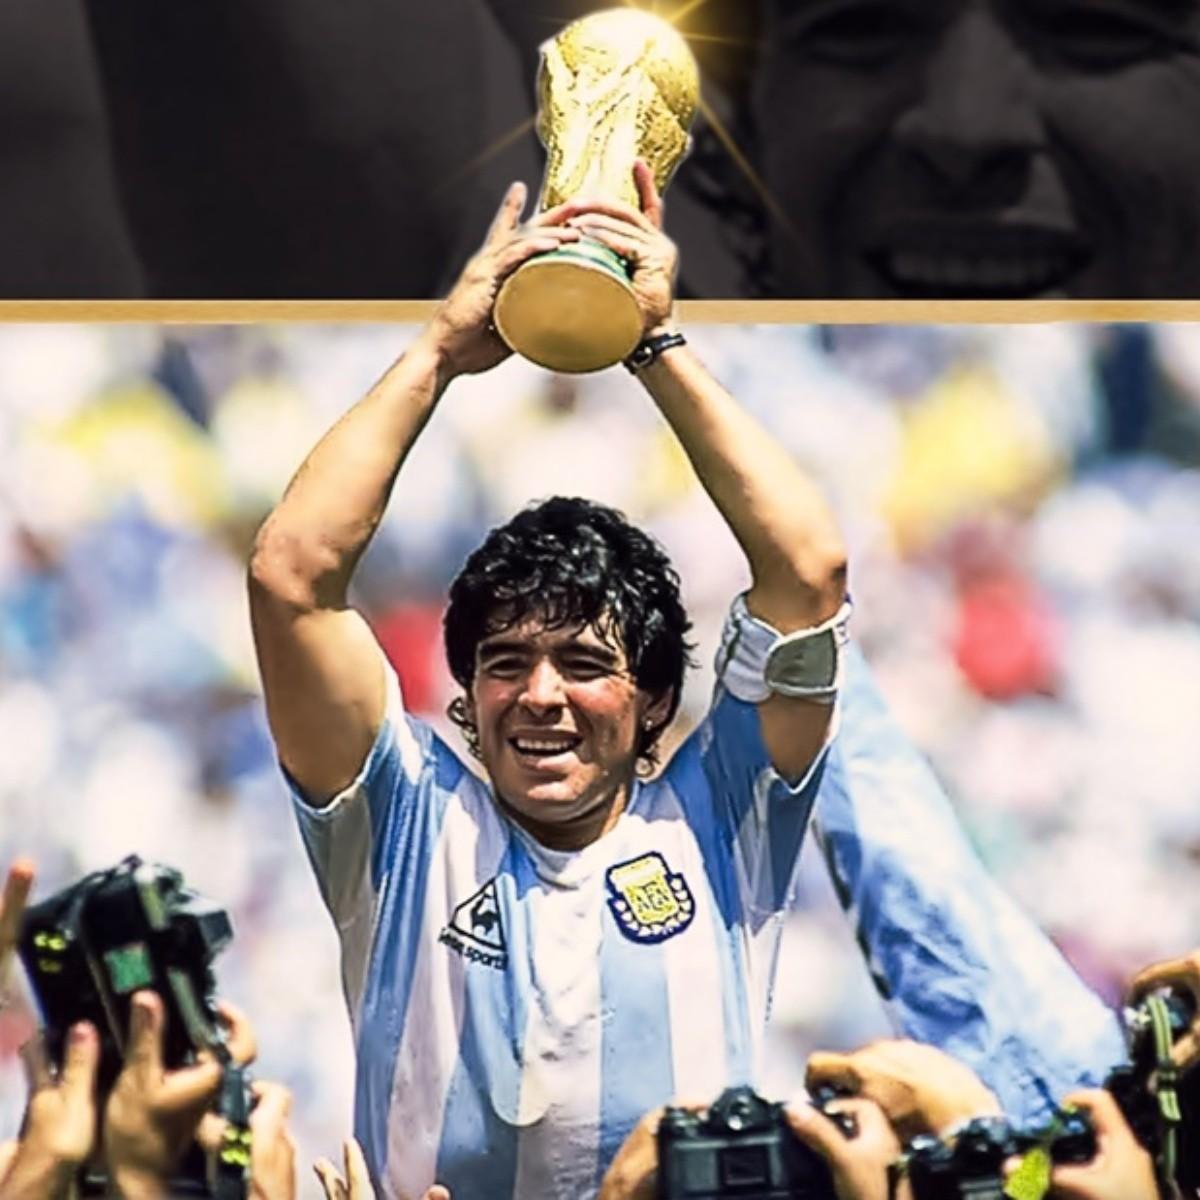 Fallece Diego Armando Maradona De Paro Cardiorrespiratorio